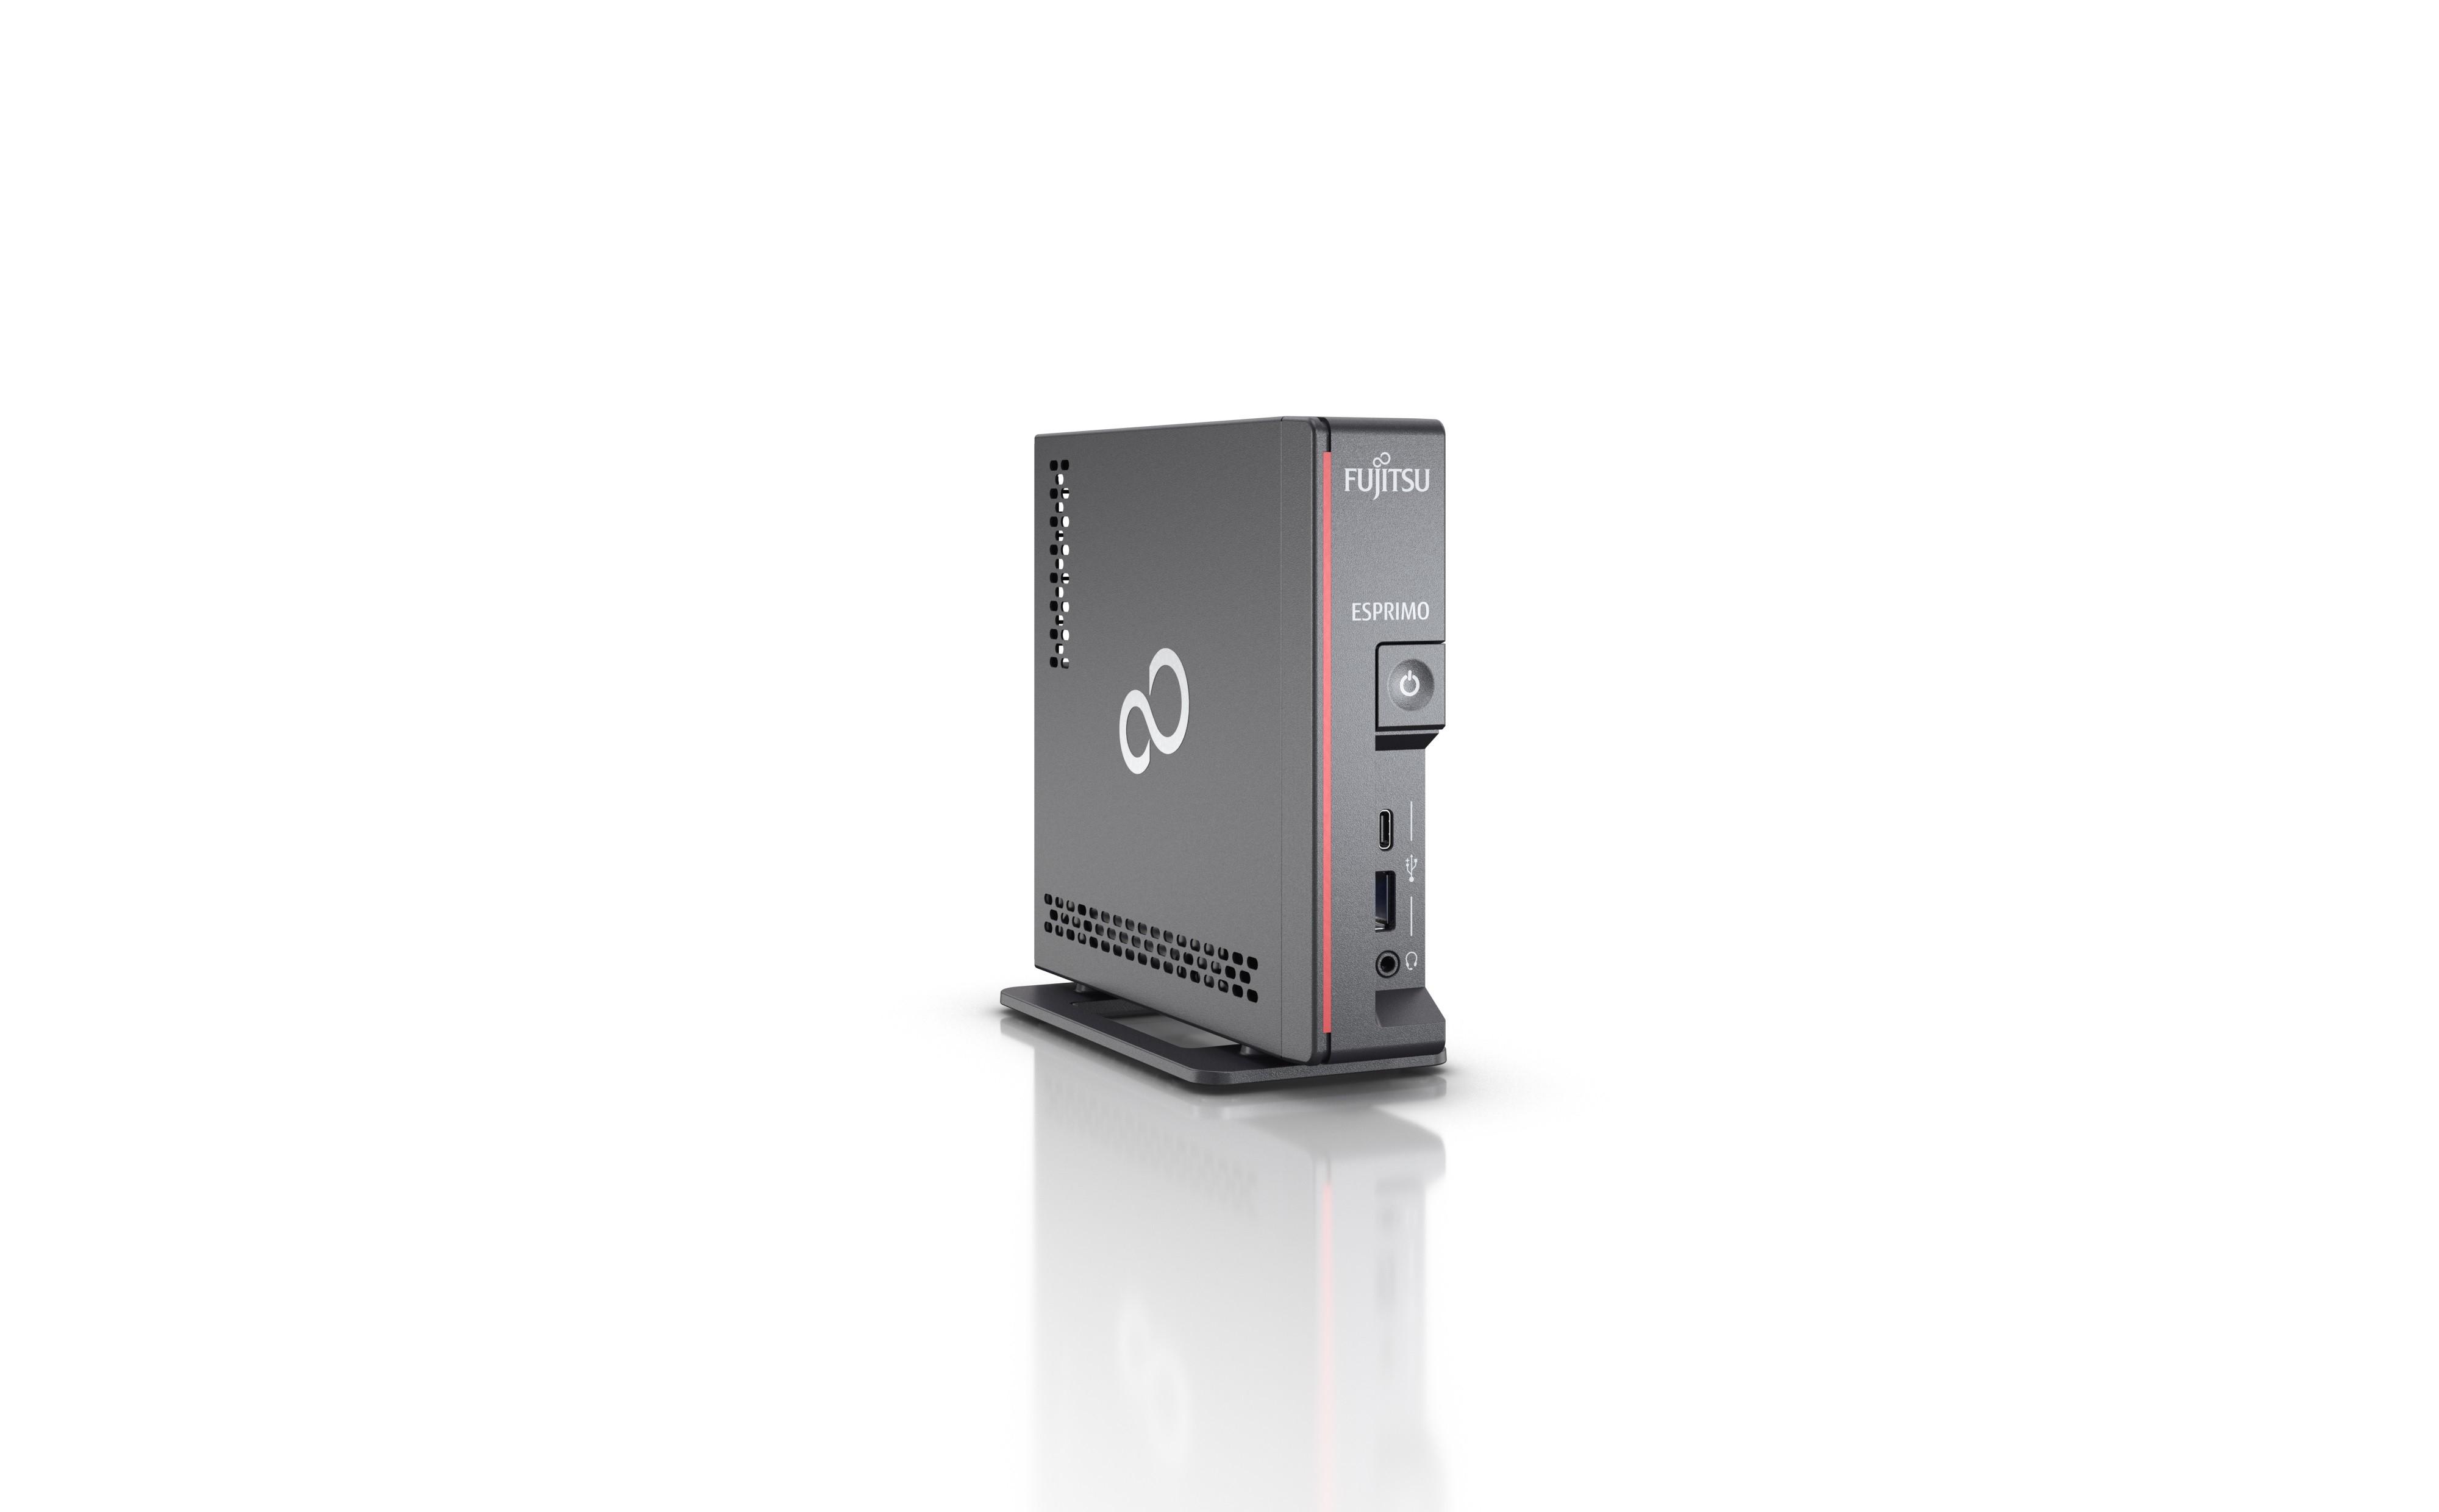 Fujitsu ESPRIMO G5010 i5-10400T mini PC Intel® 10de generatie Core™ i5 8 GB DDR4-SDRAM 256 GB SSD Windows 10 Pro Zwart